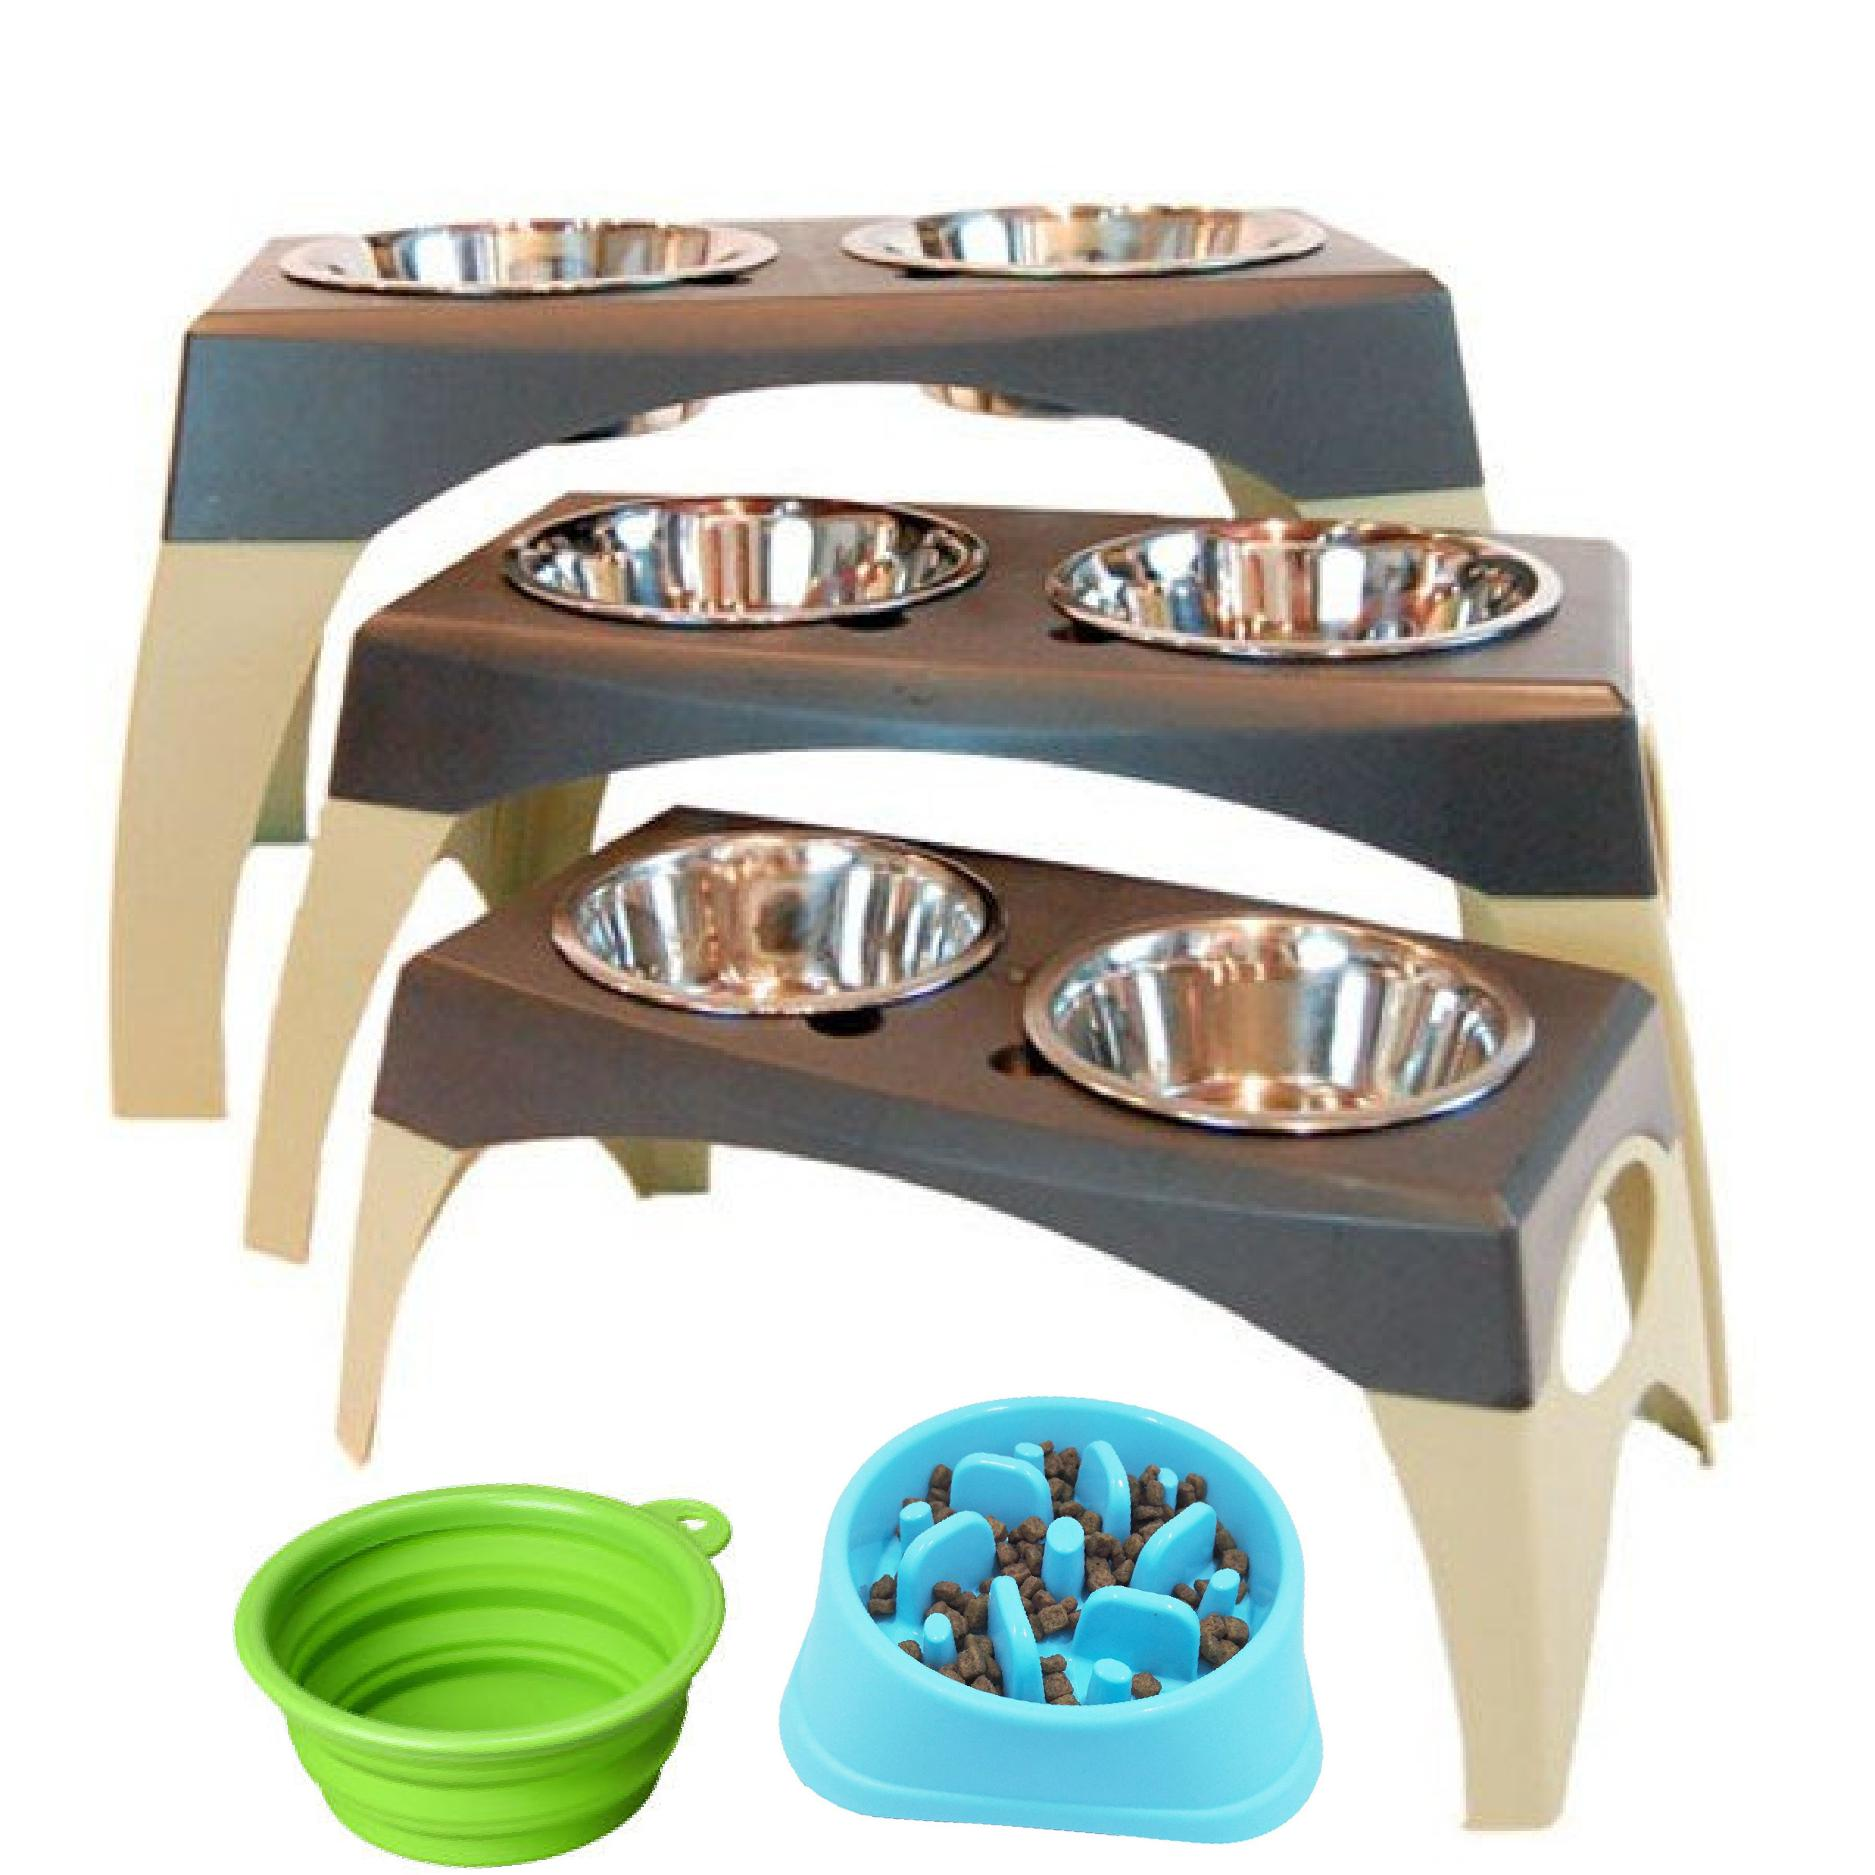 Shop Bowls & Feeders | Peacebone